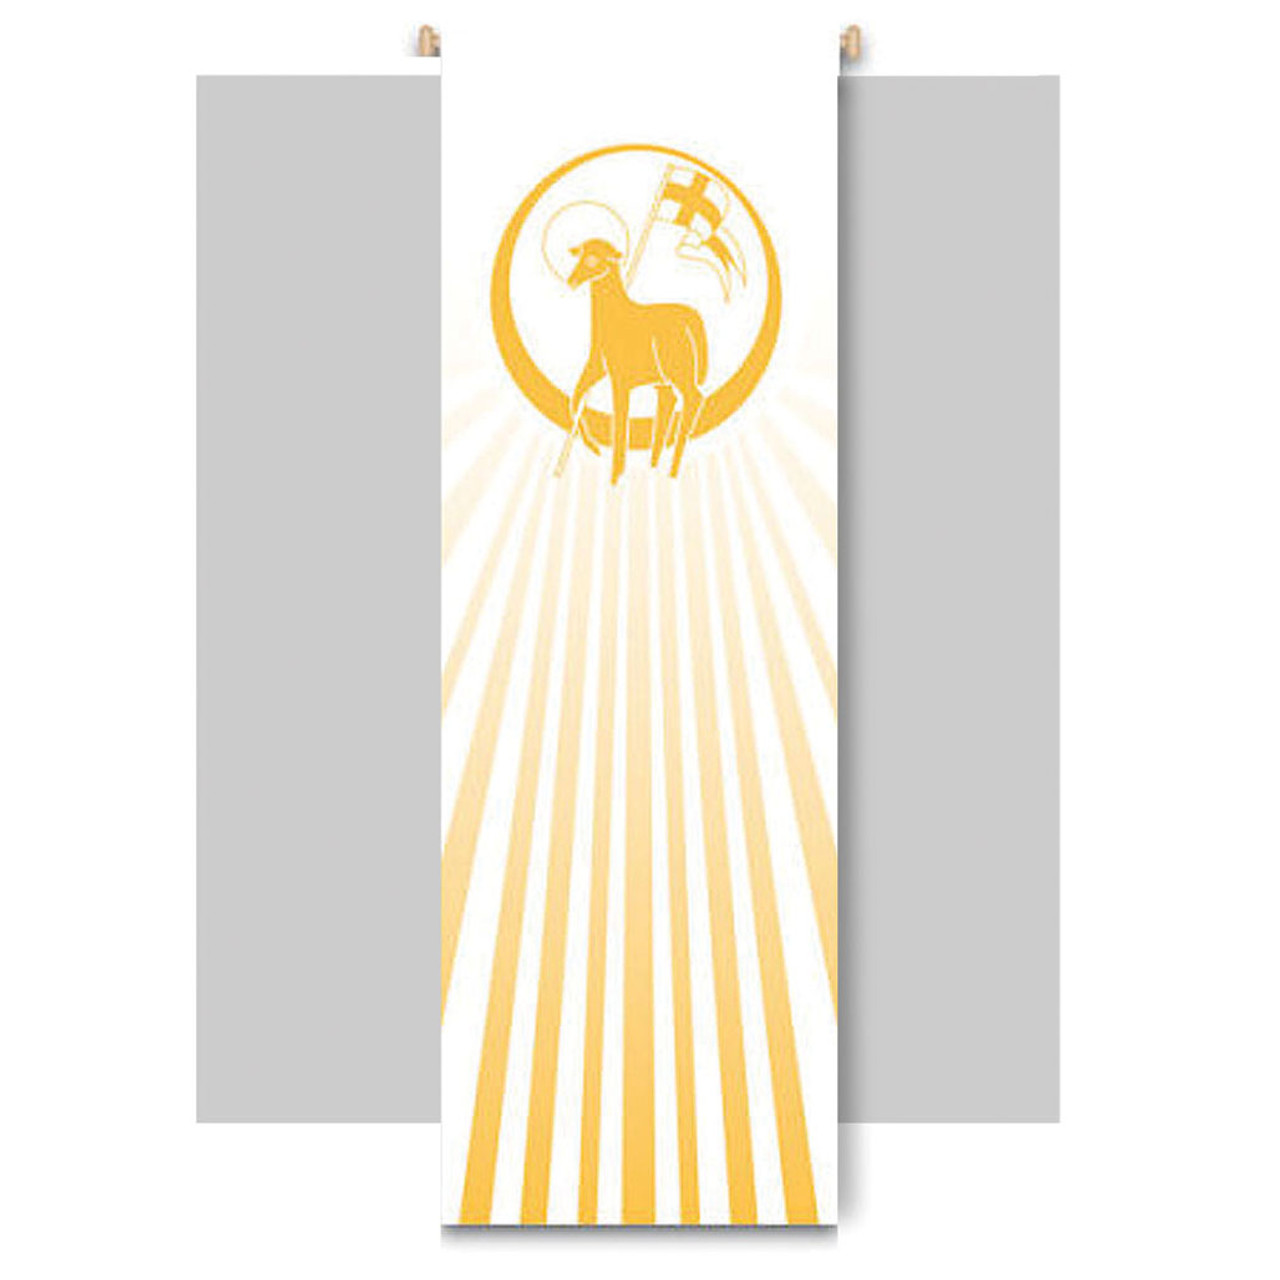 Art Studio Slabbinck Lamb of God Church Banner 9x3 Feet